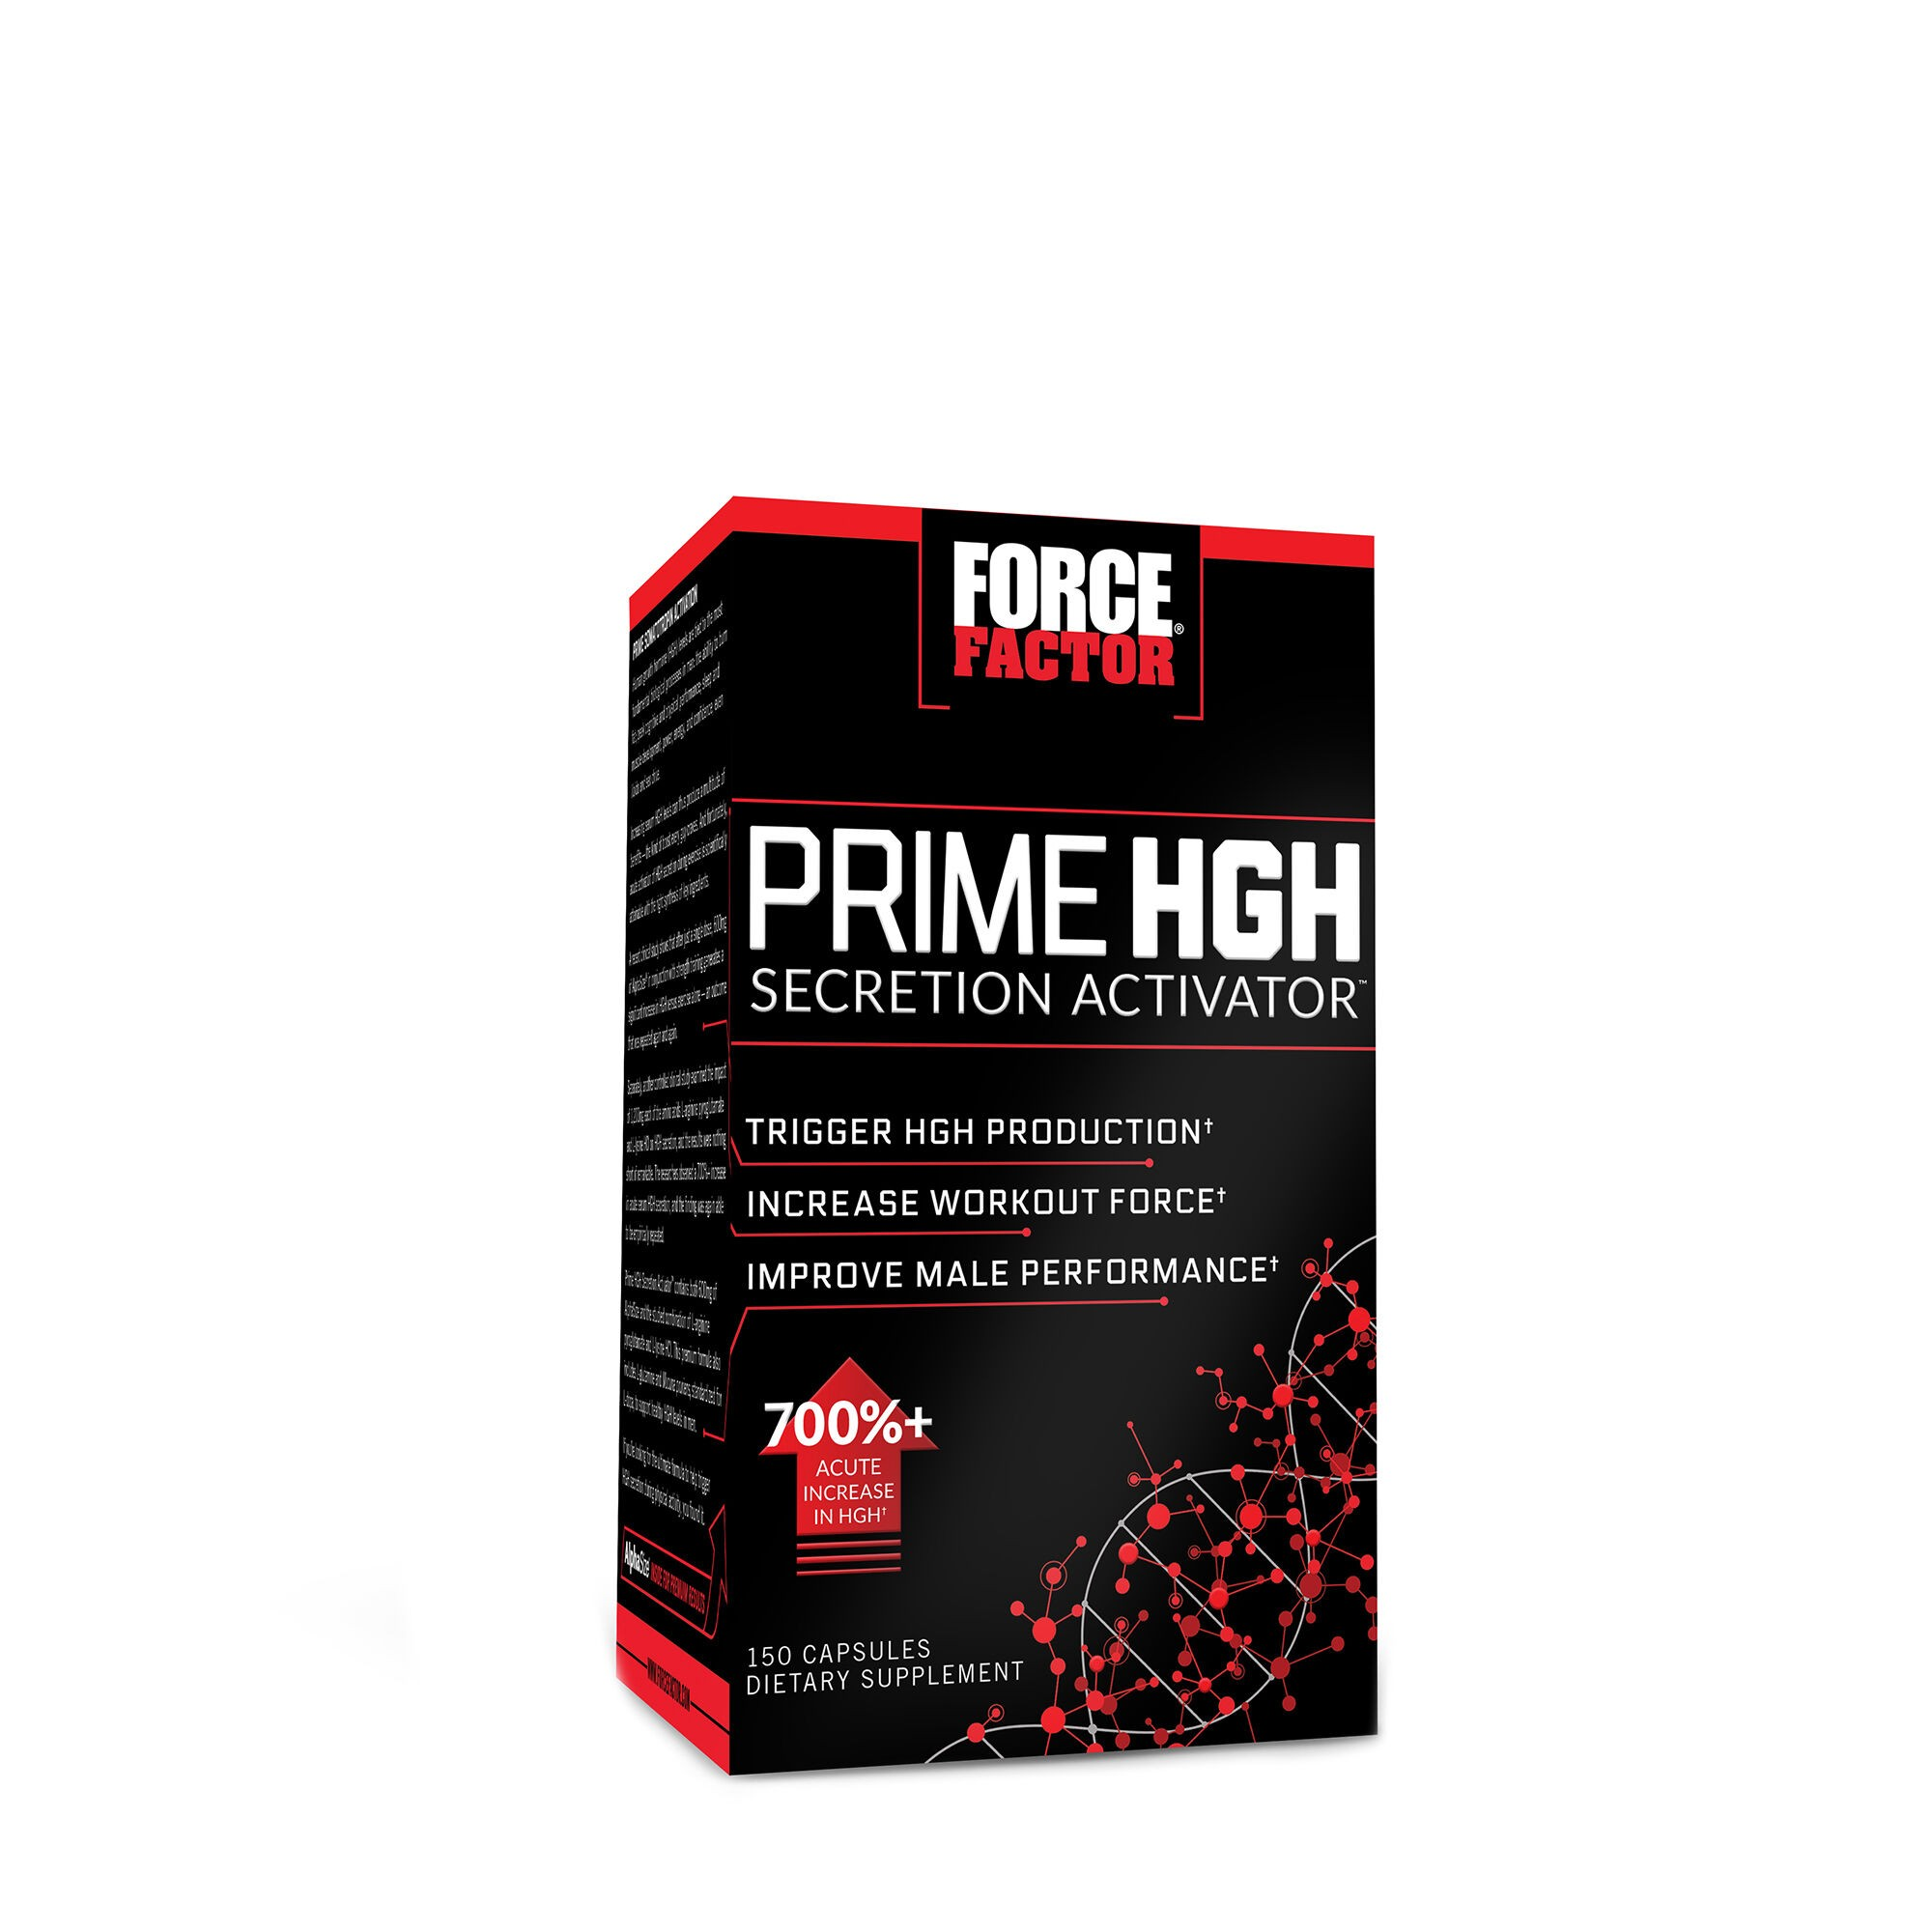 Force Factor® Prime HGH Secretion Activator™, 150 cps